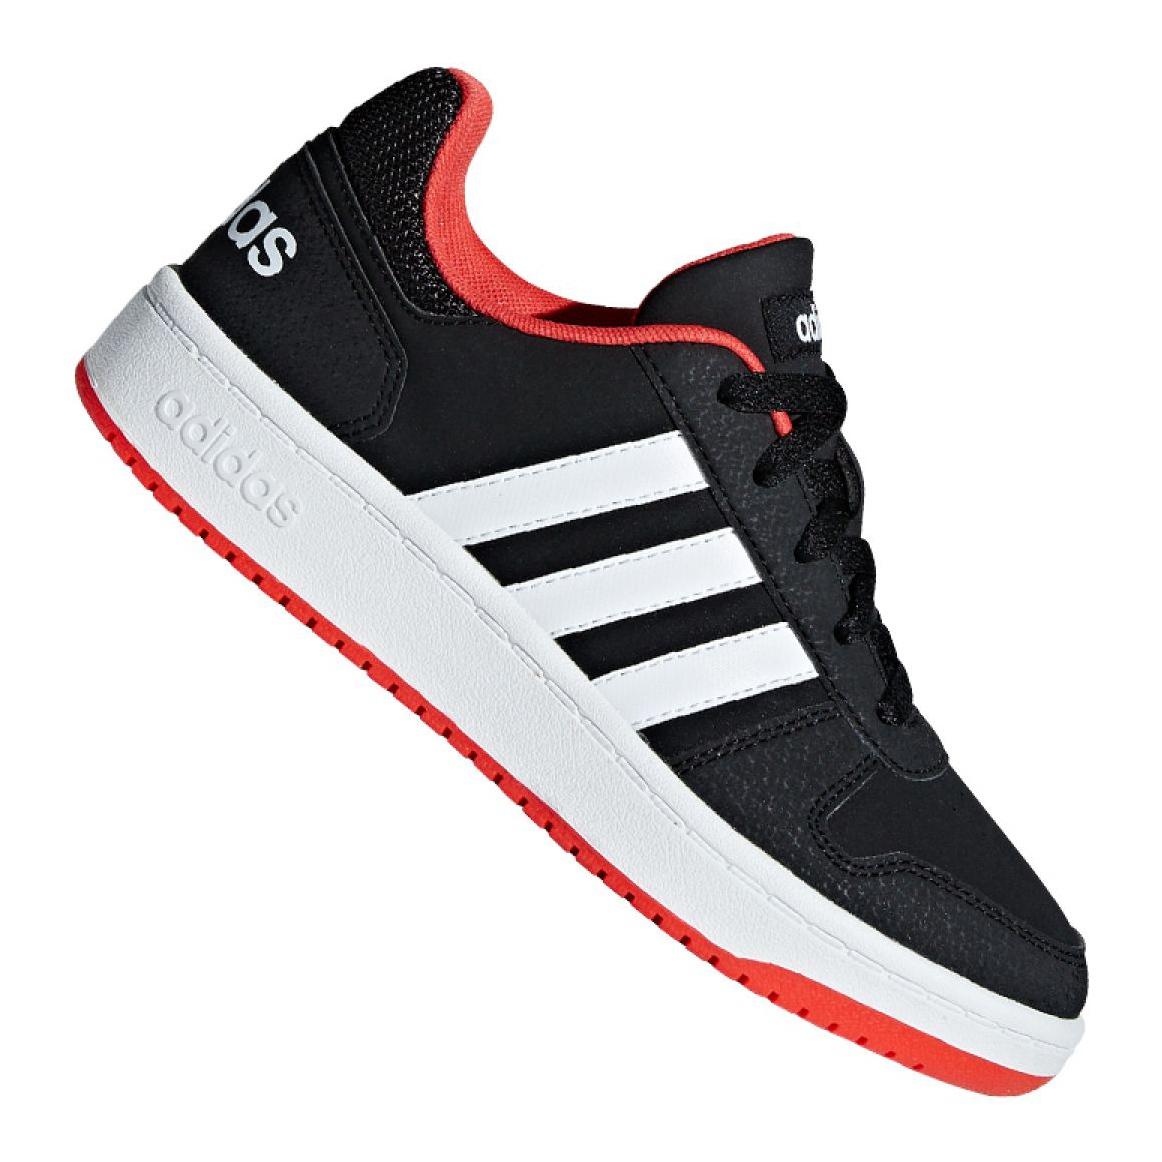 Buty adidas Hoops 2.0 Jr B76067 r.35,5